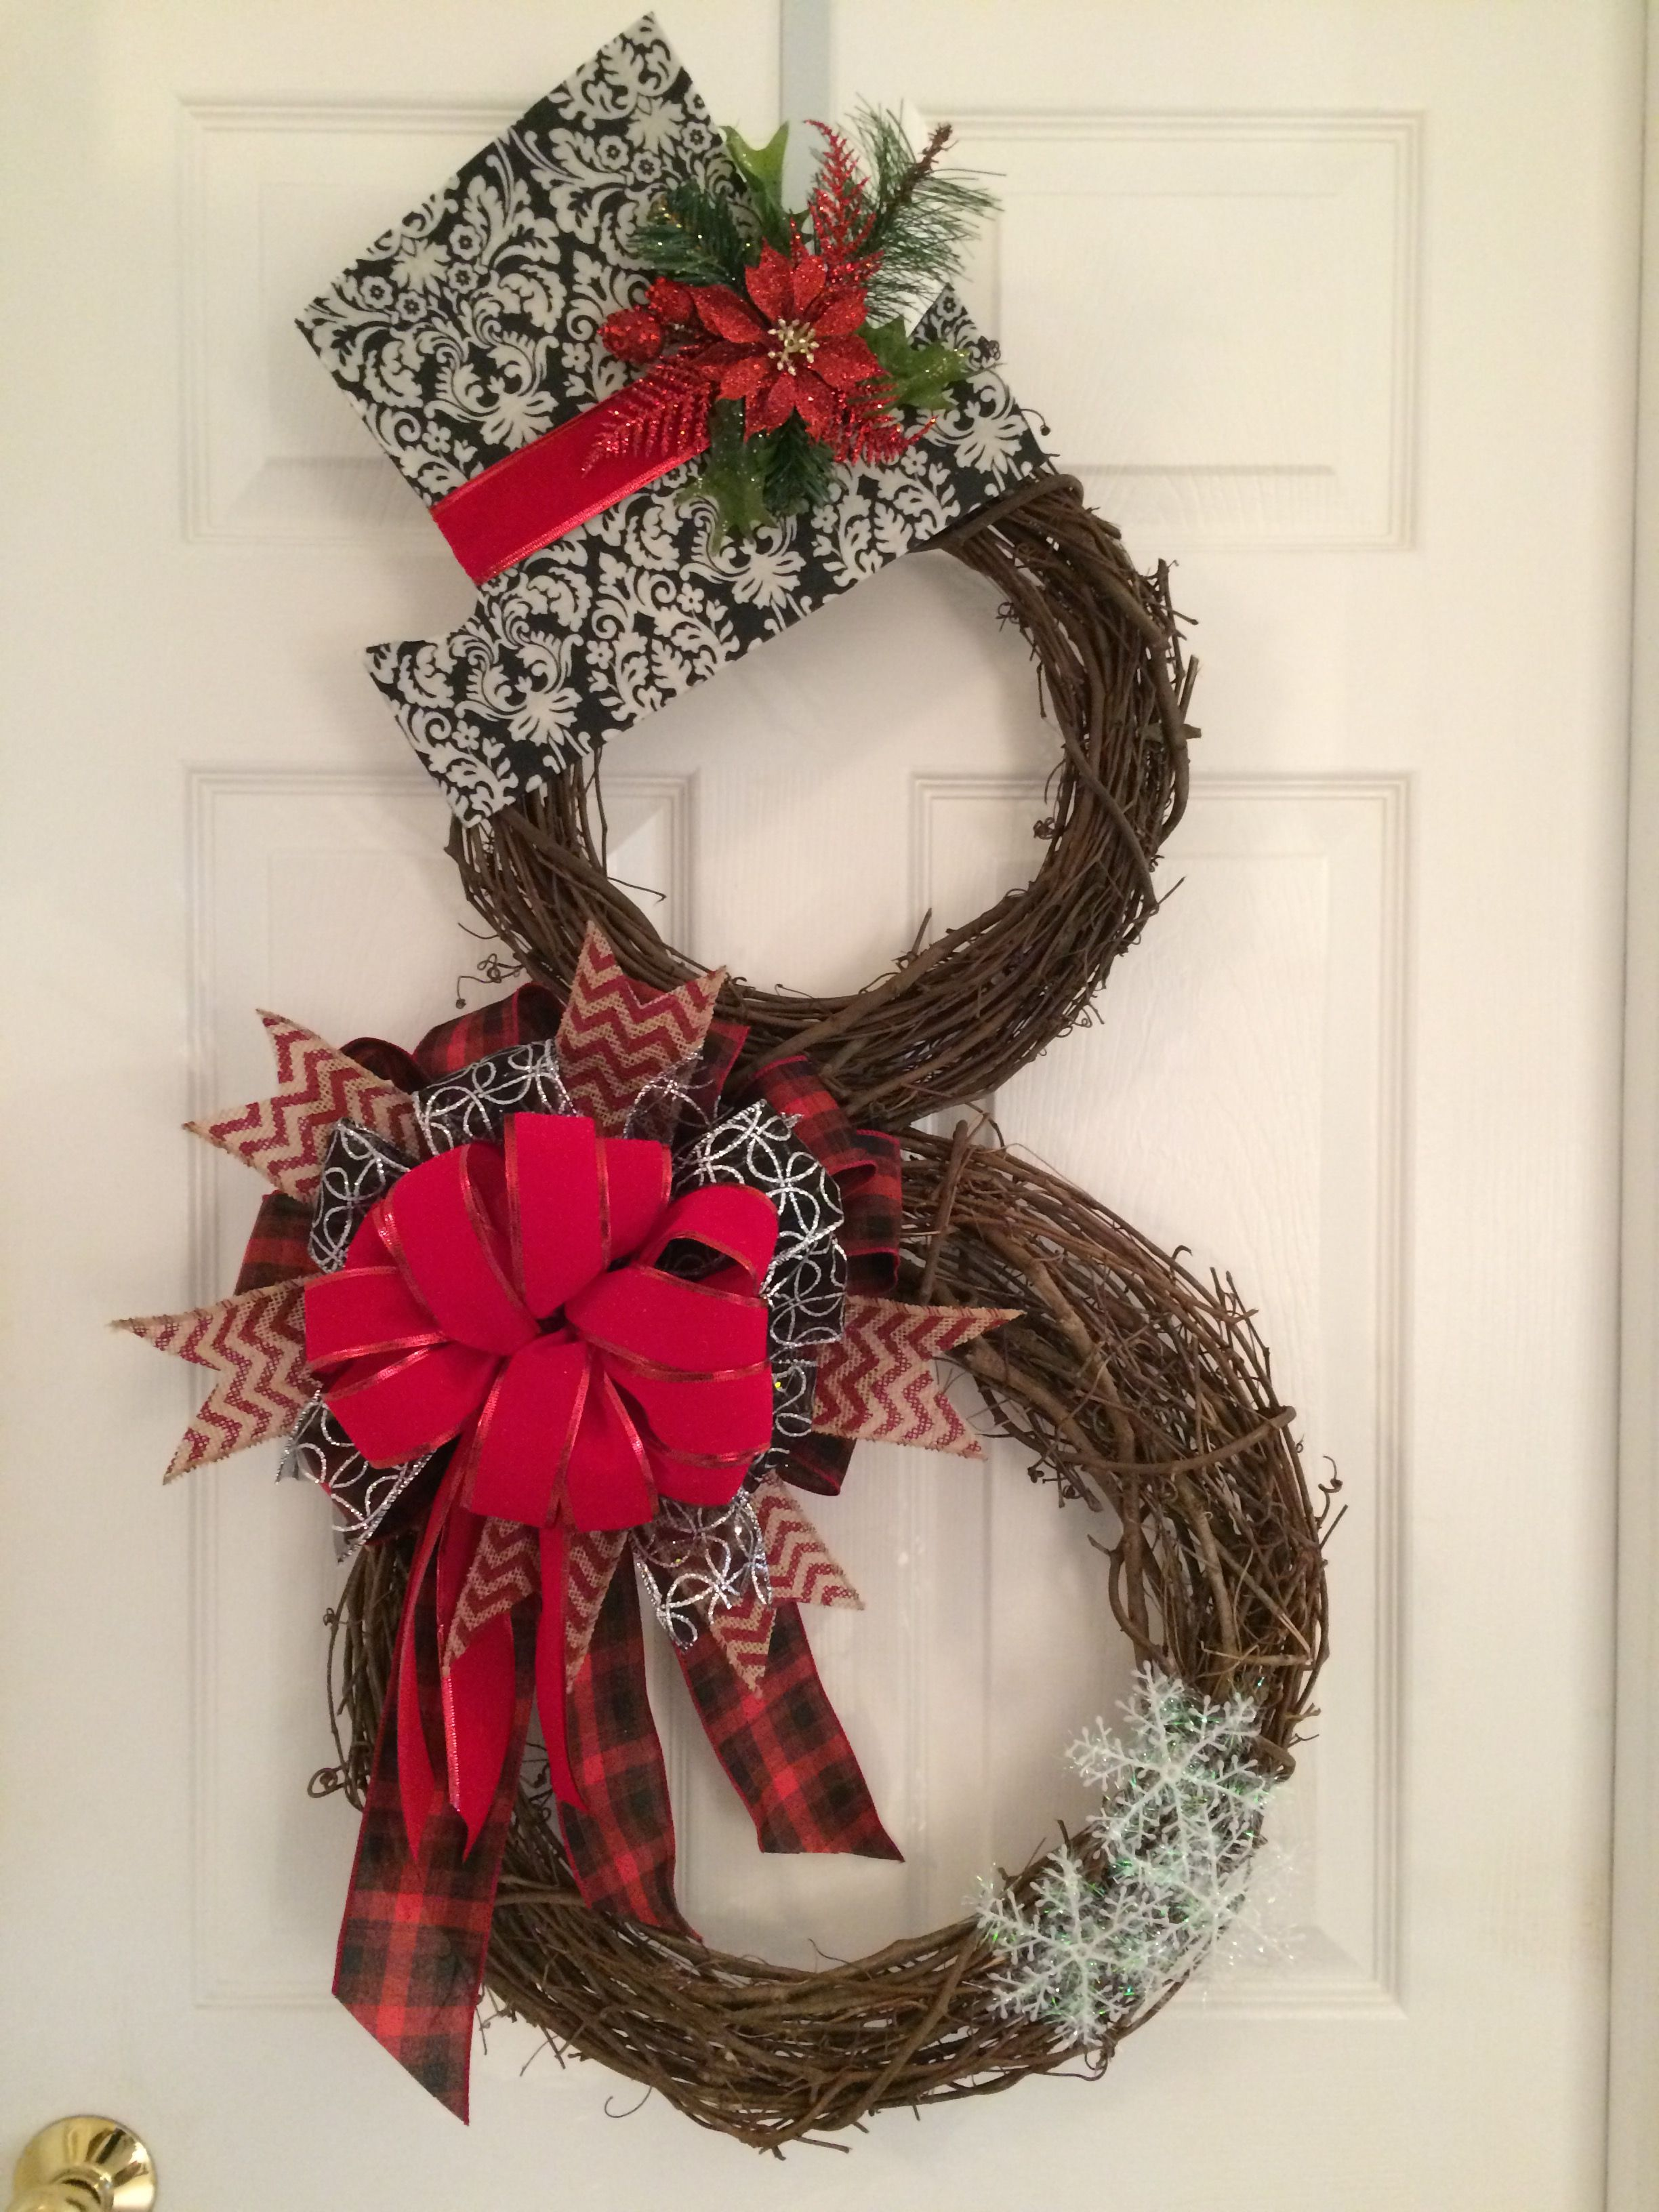 Snowman Grapevine Wreath Christmas Wreaths Christmas Wreaths Diy Holiday Wreaths